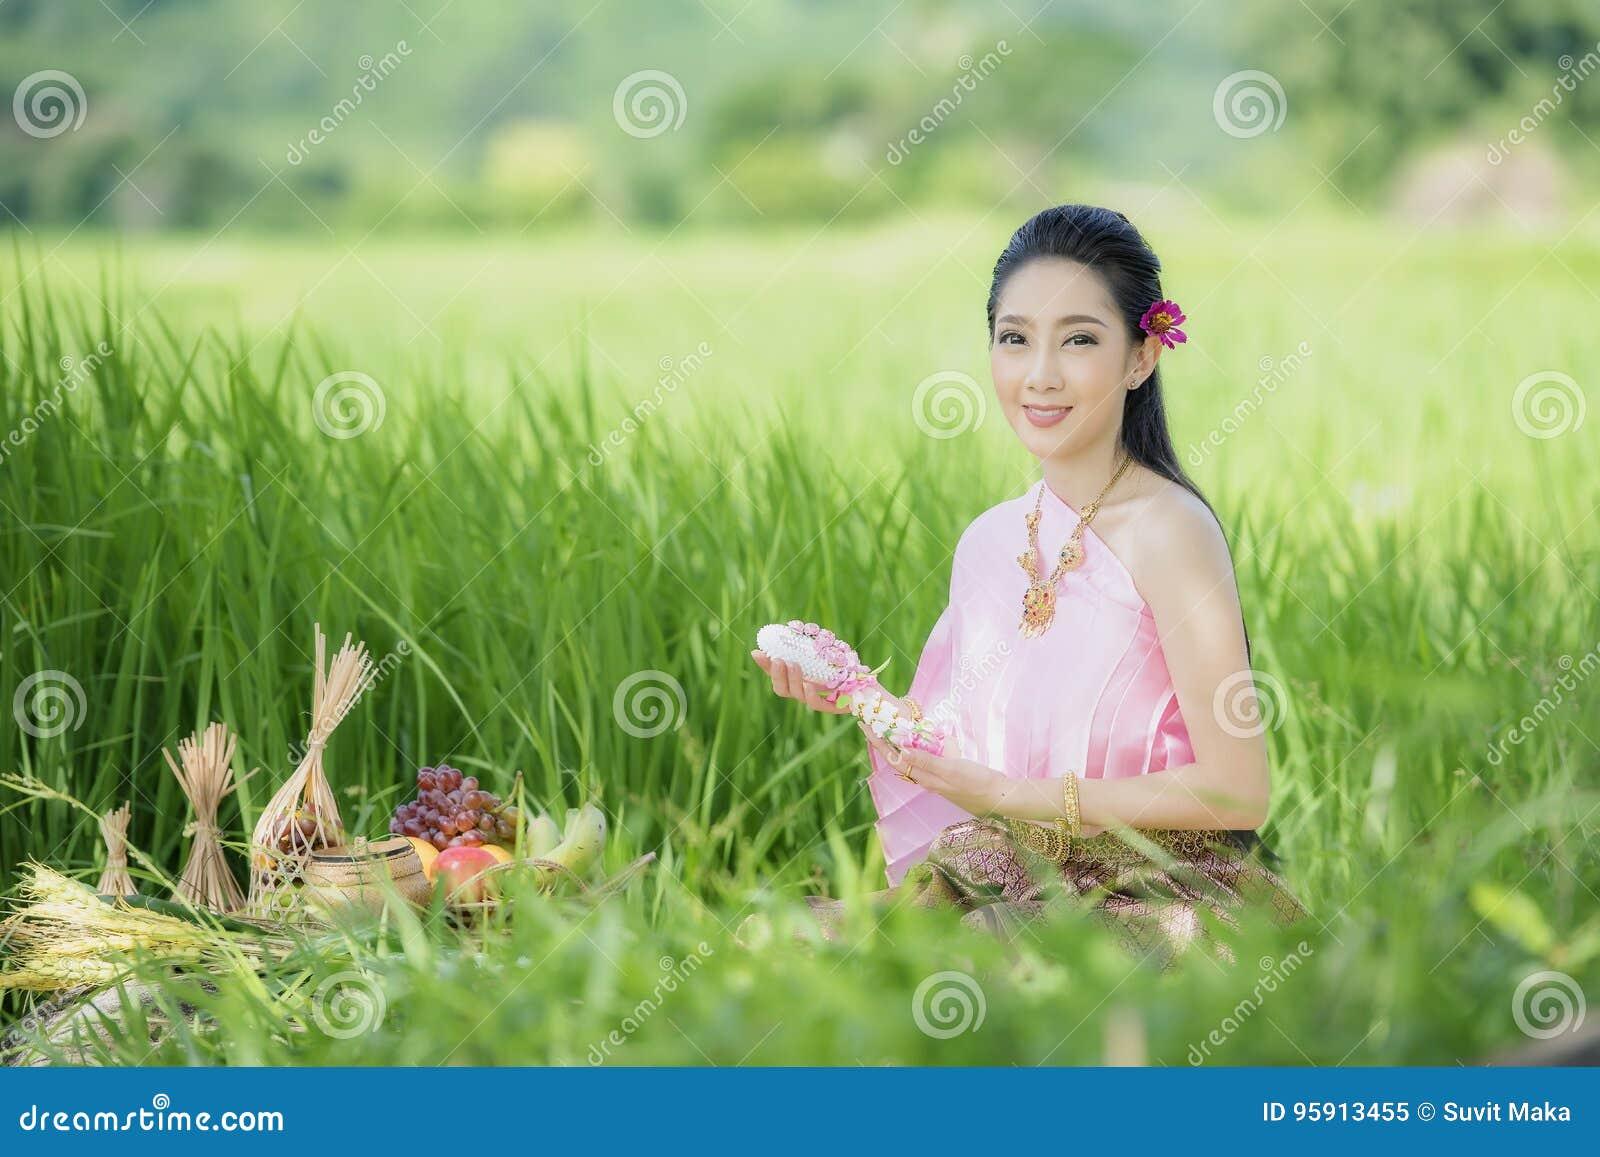 Tajlandzki rolnik w Tajlandzkiej sukni